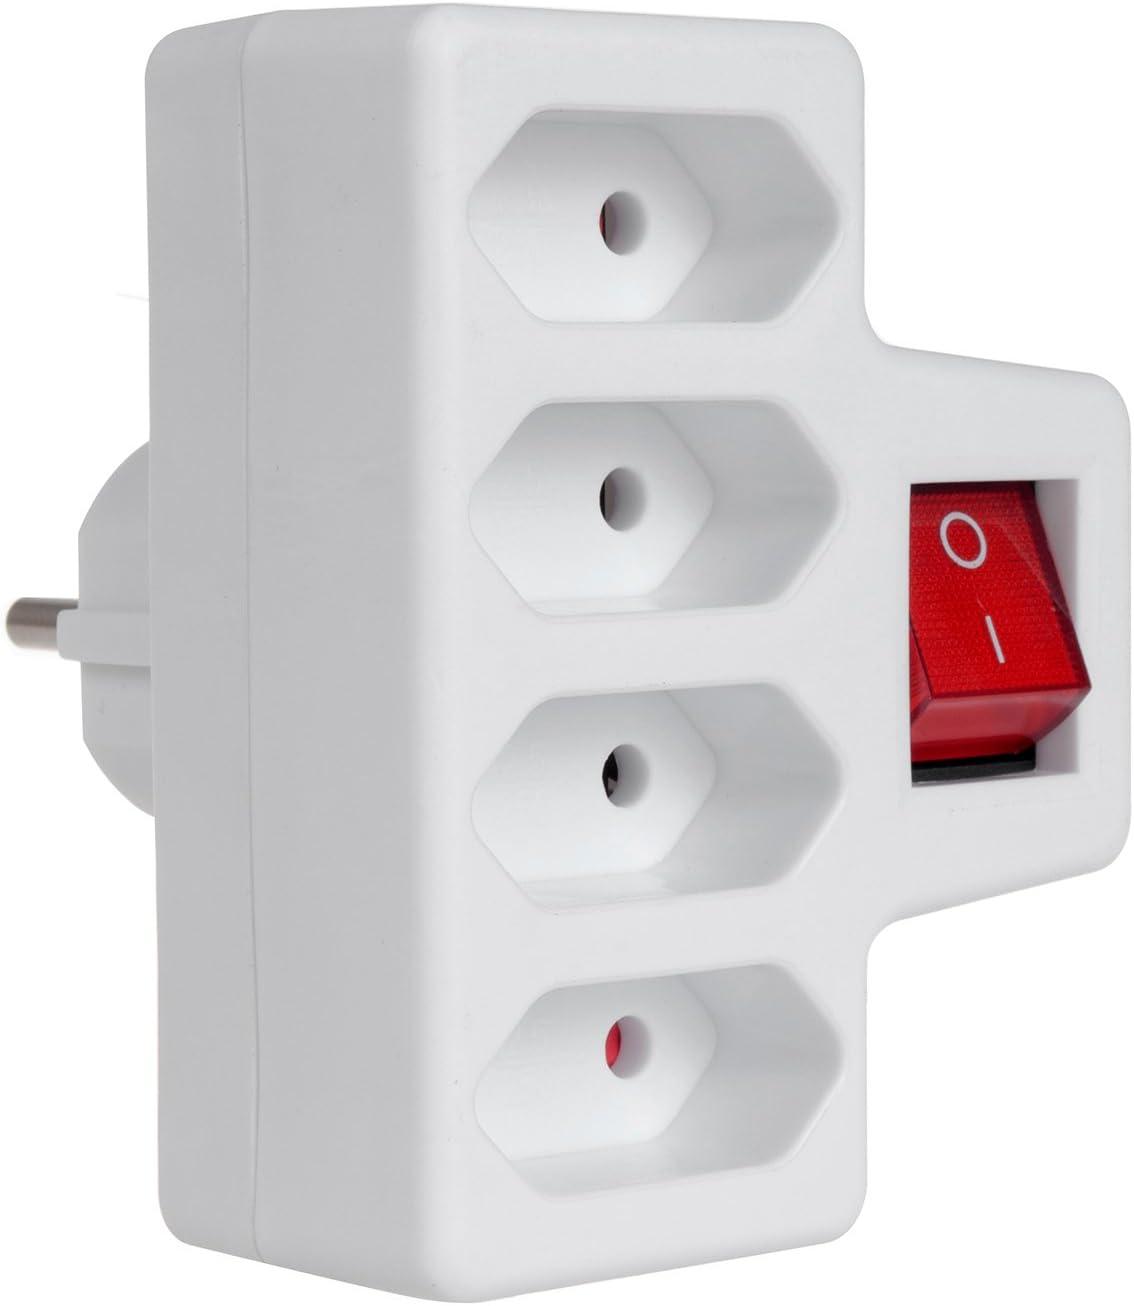 2-4 Fach Steckdose Steckdosenleiste Mehrfach Steckdosenverteiler Adapter EU Plug